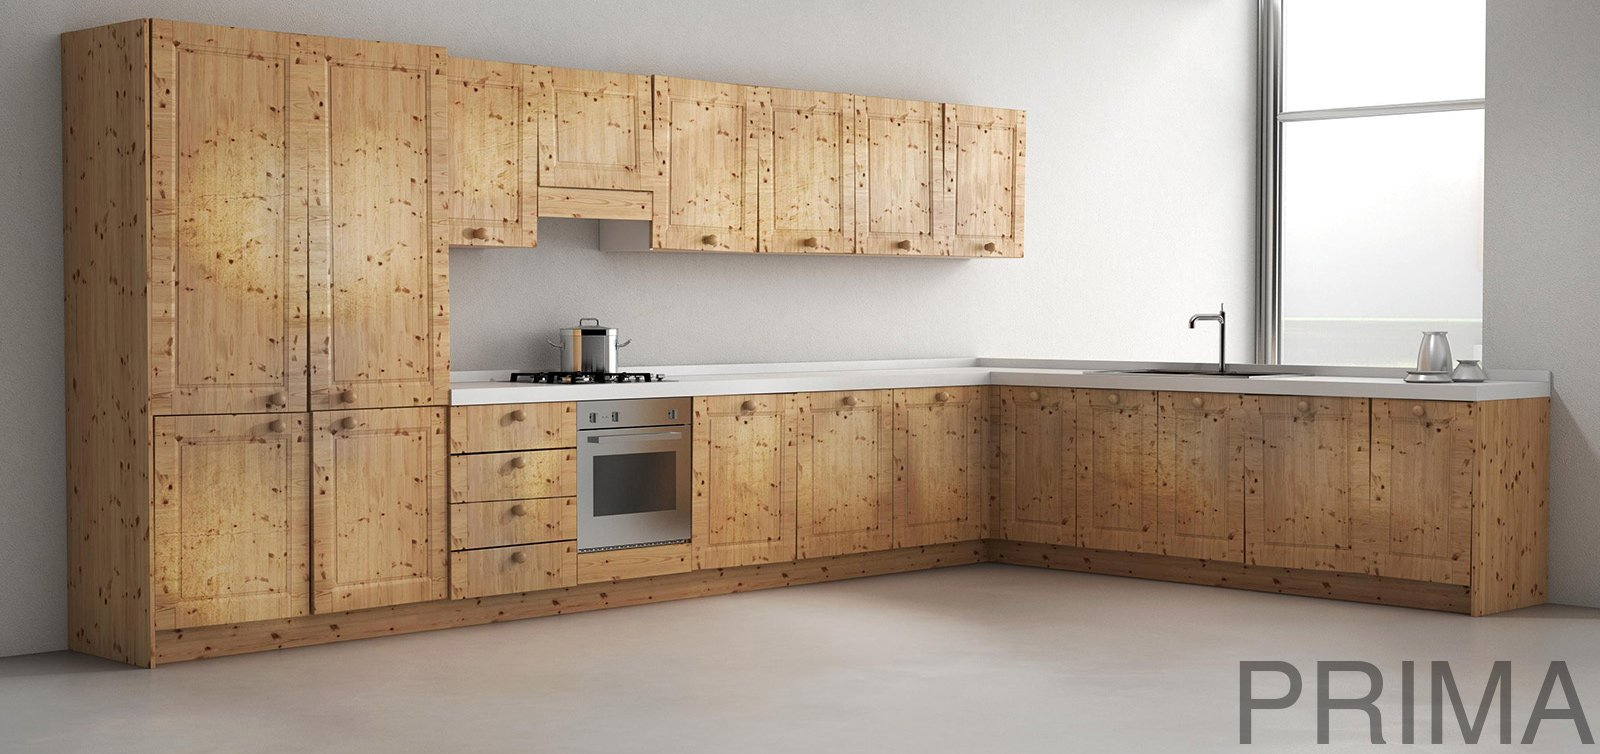 Rimodernare mobili cucina fai da te mobilia la tua casa - Cucina in casa ...